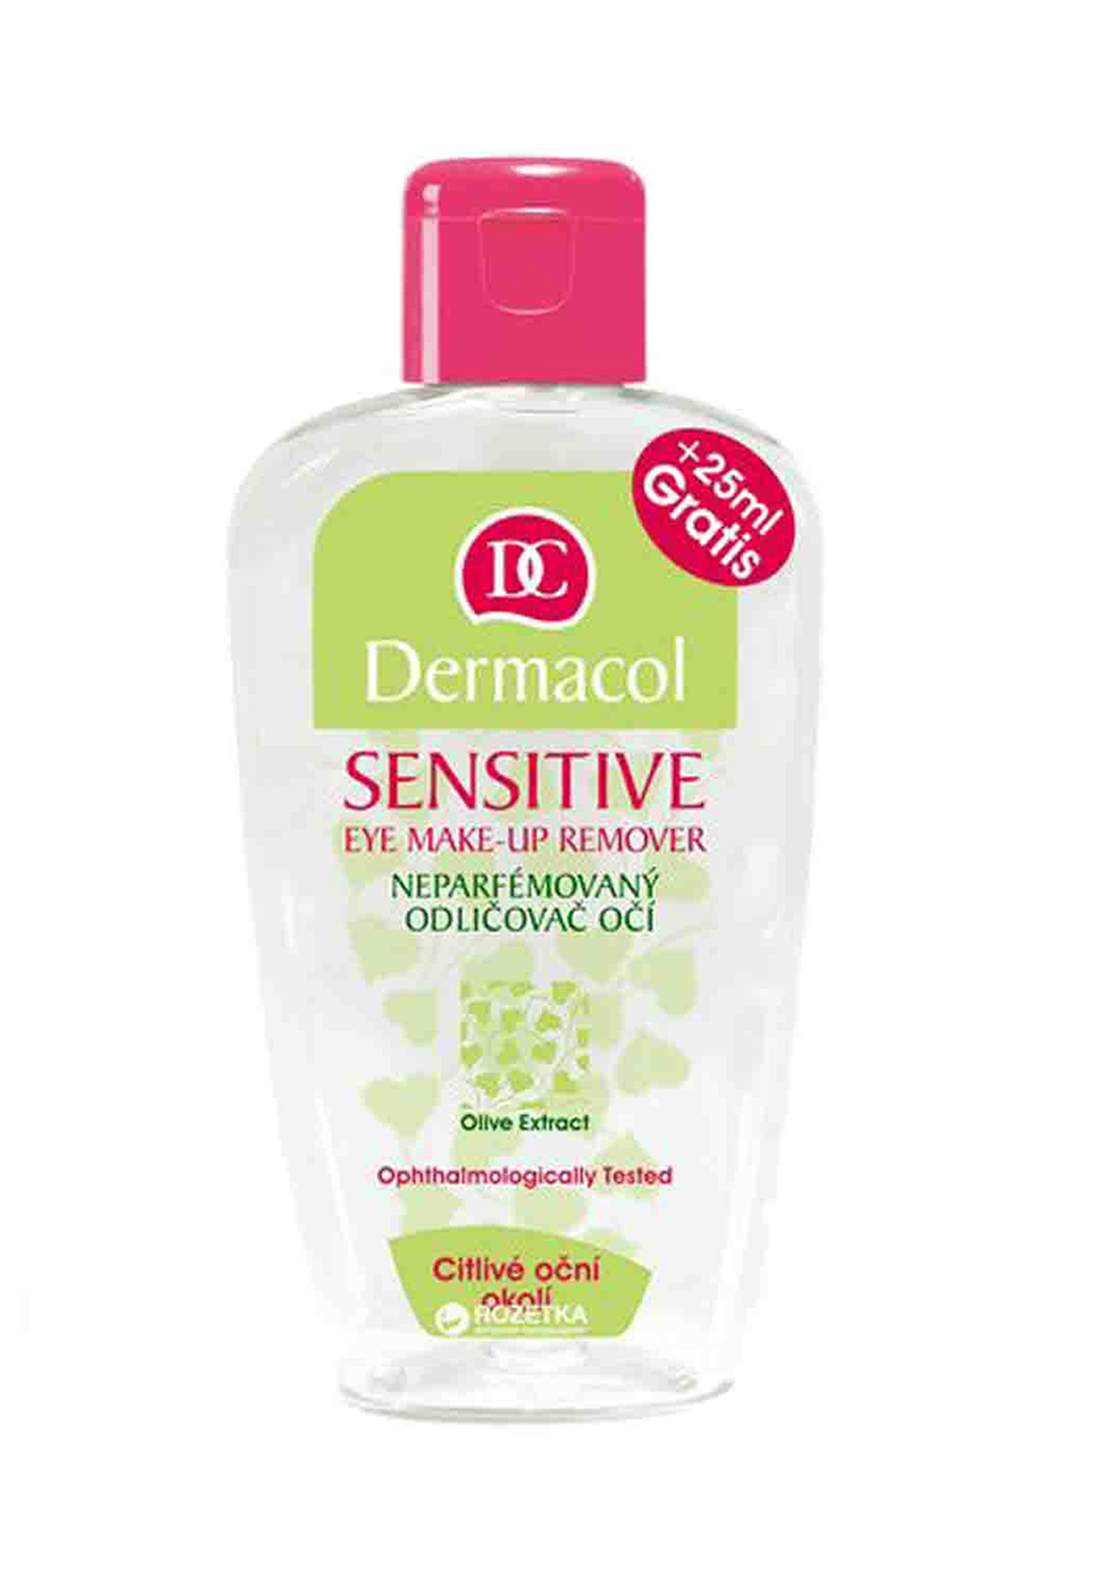 Dermacol Sensitive Eye Make-up Remover 150 ml مزيل مكياج للعيون الحساسة من ديرماكول